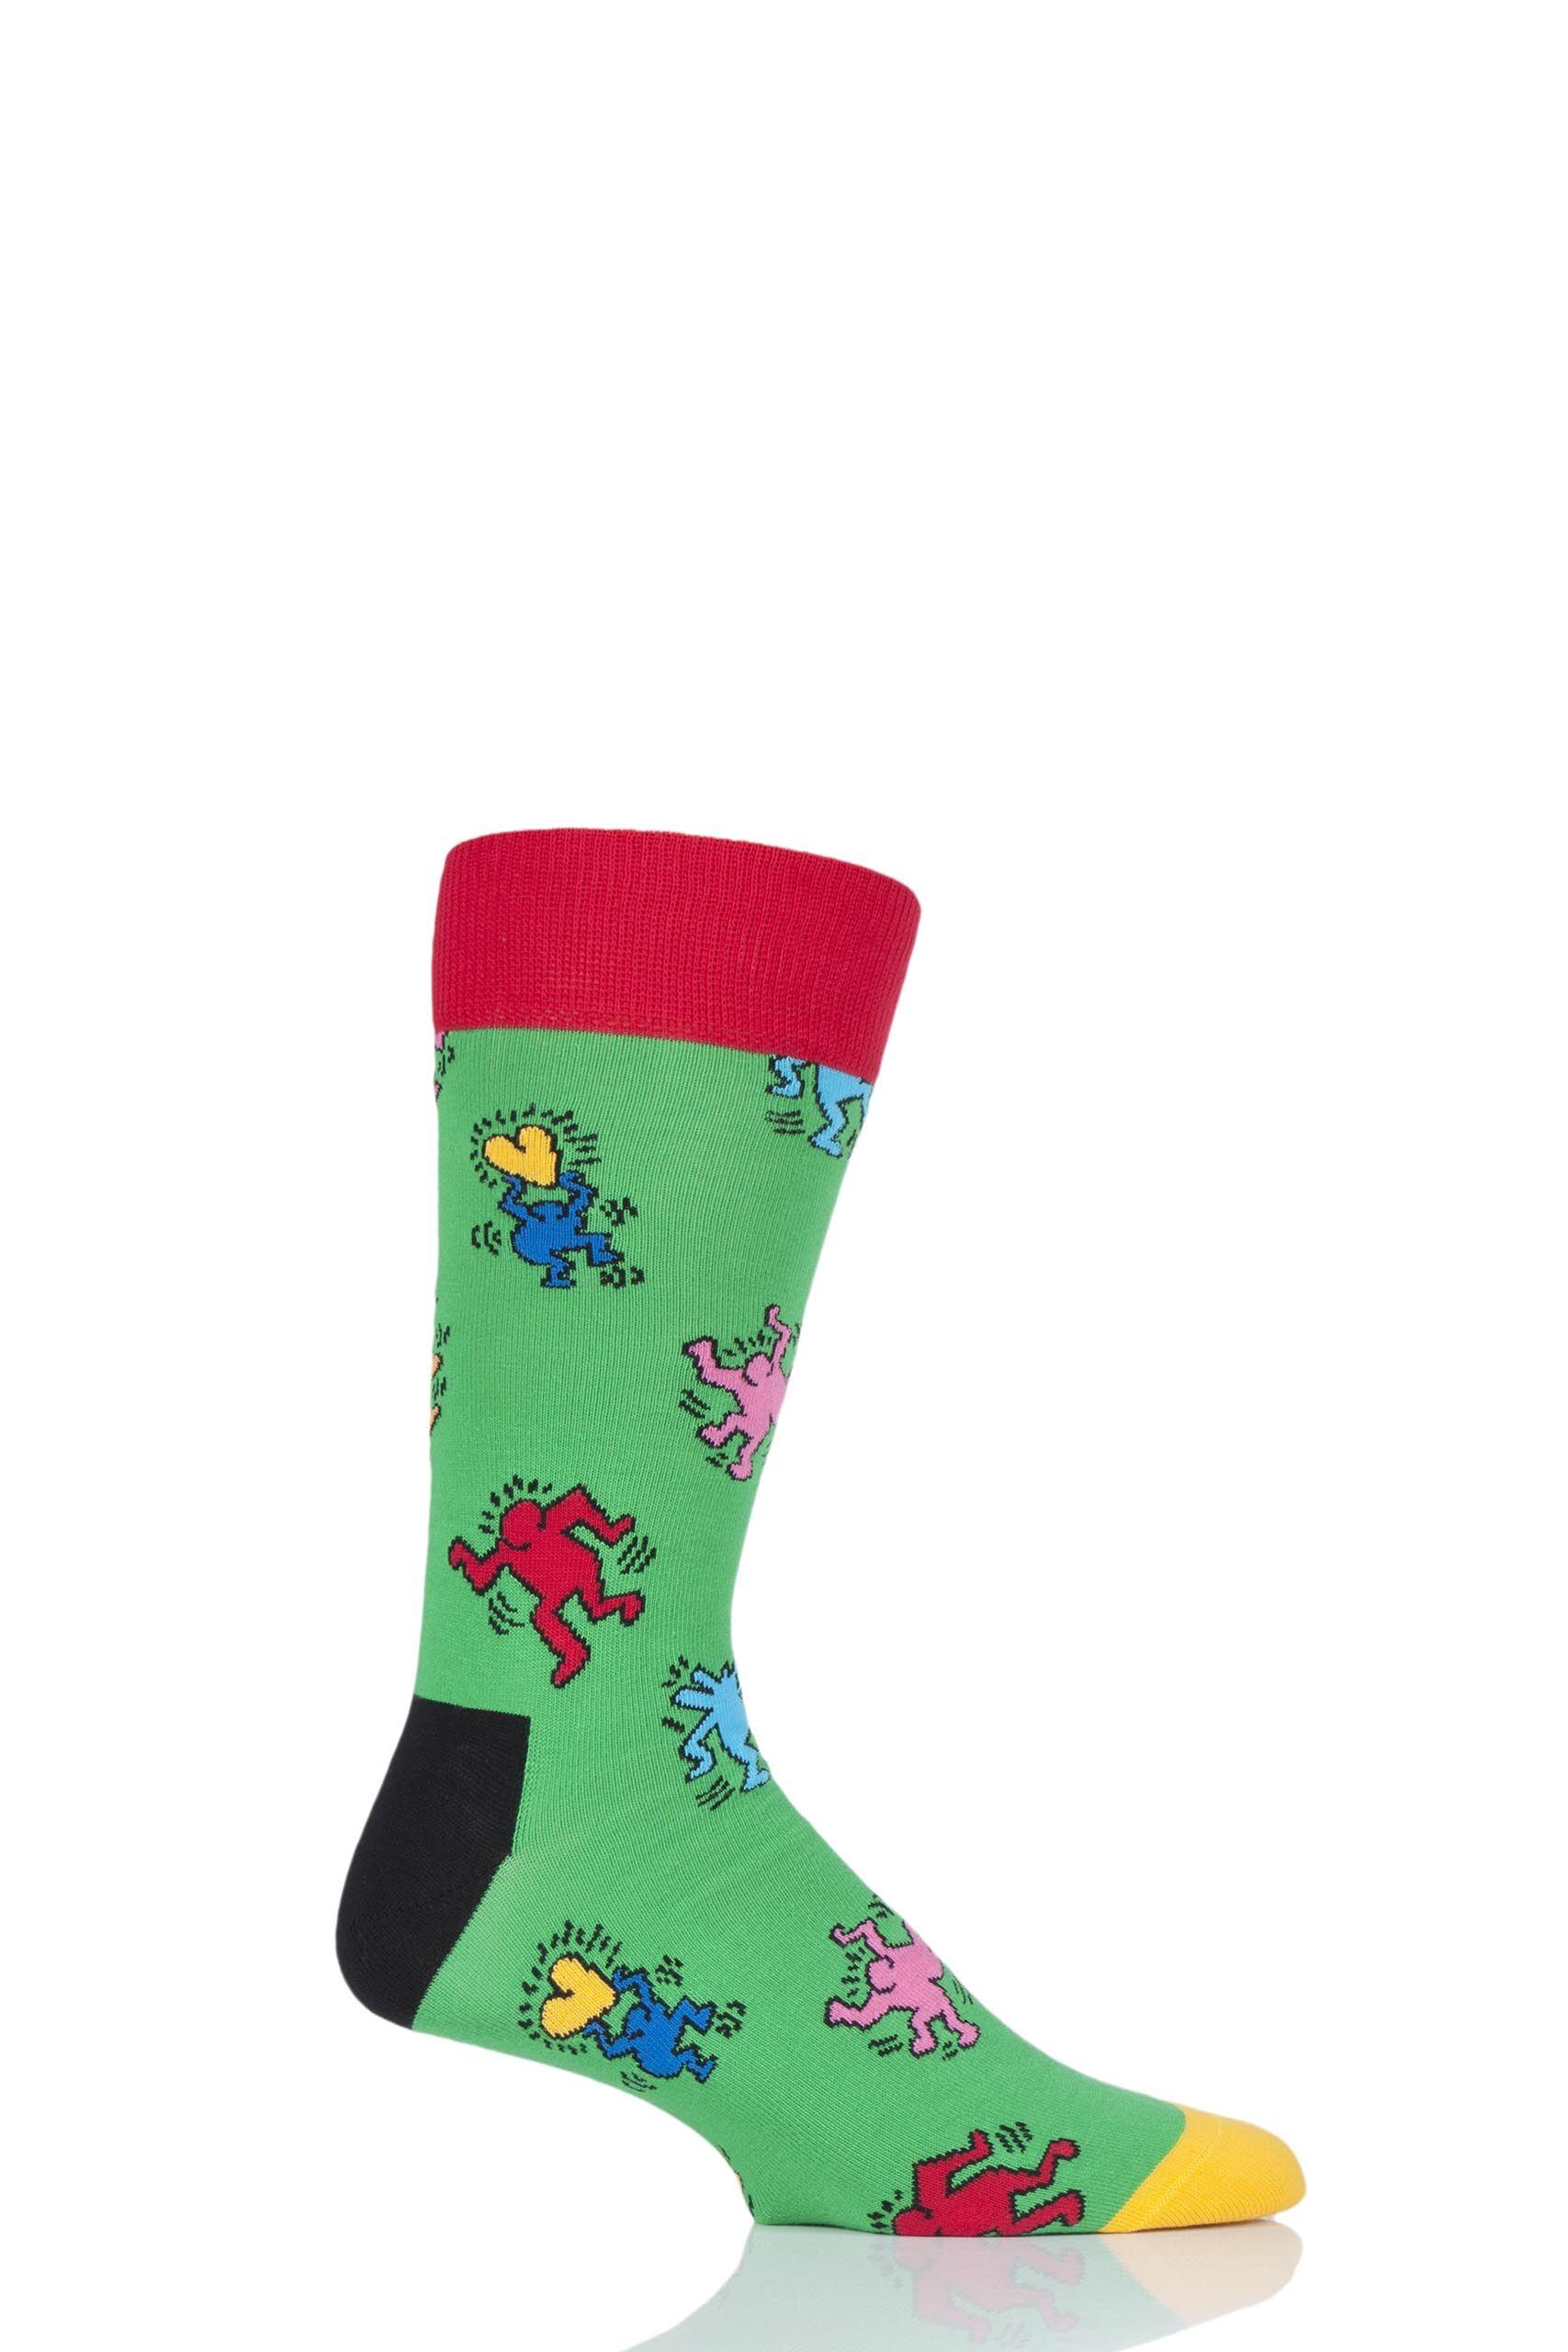 Image of 1 Pair Assorted Keith Haring Dancing Socks Unisex 7.5-11.5 Unisex - Happy Socks